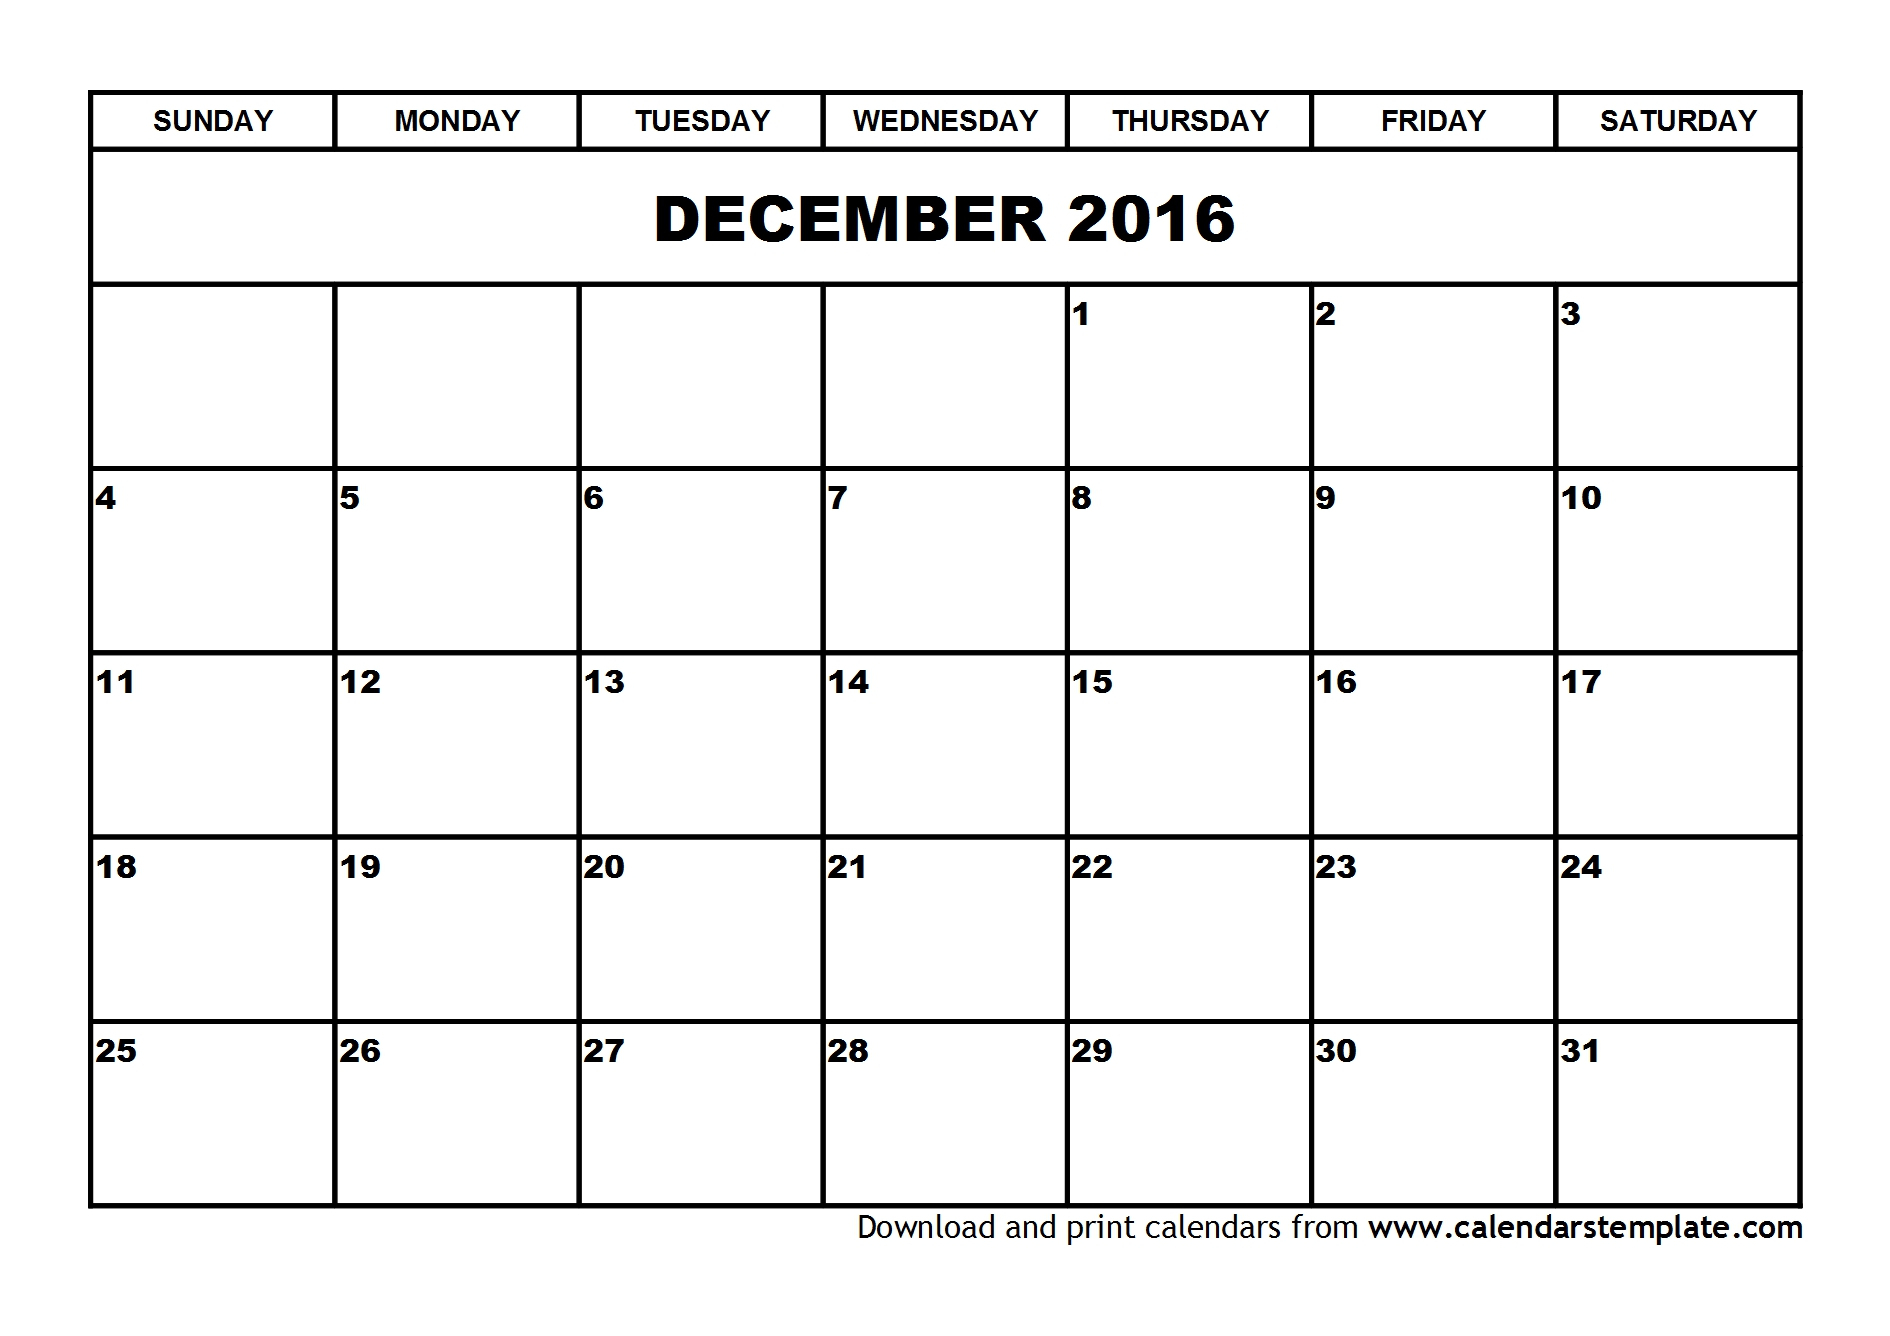 Photo Calendar Free Printable Word Templates Blank Monthly Template inside December Blank Monthly Calendar